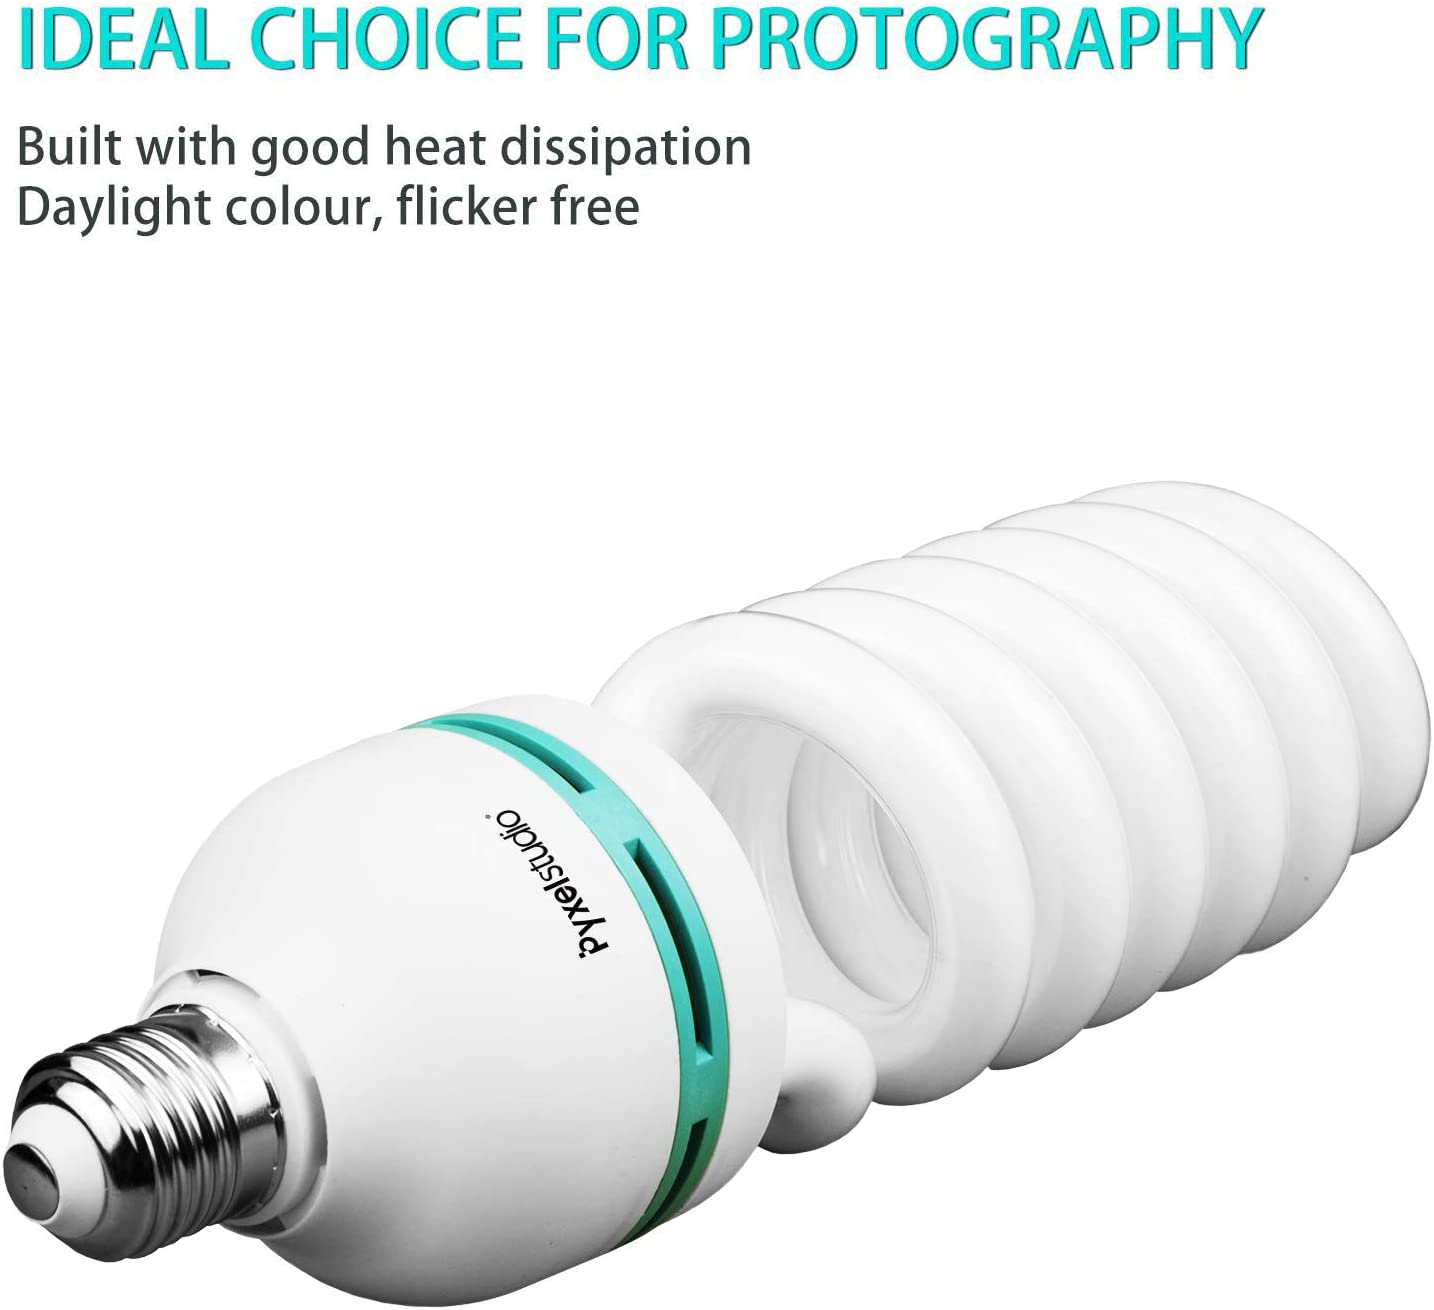 E27 5500k 135w Fotostudio Birne Video Fotografie Helle Tageslichtlampe E27 135w Glühbirne Küche Haushalt